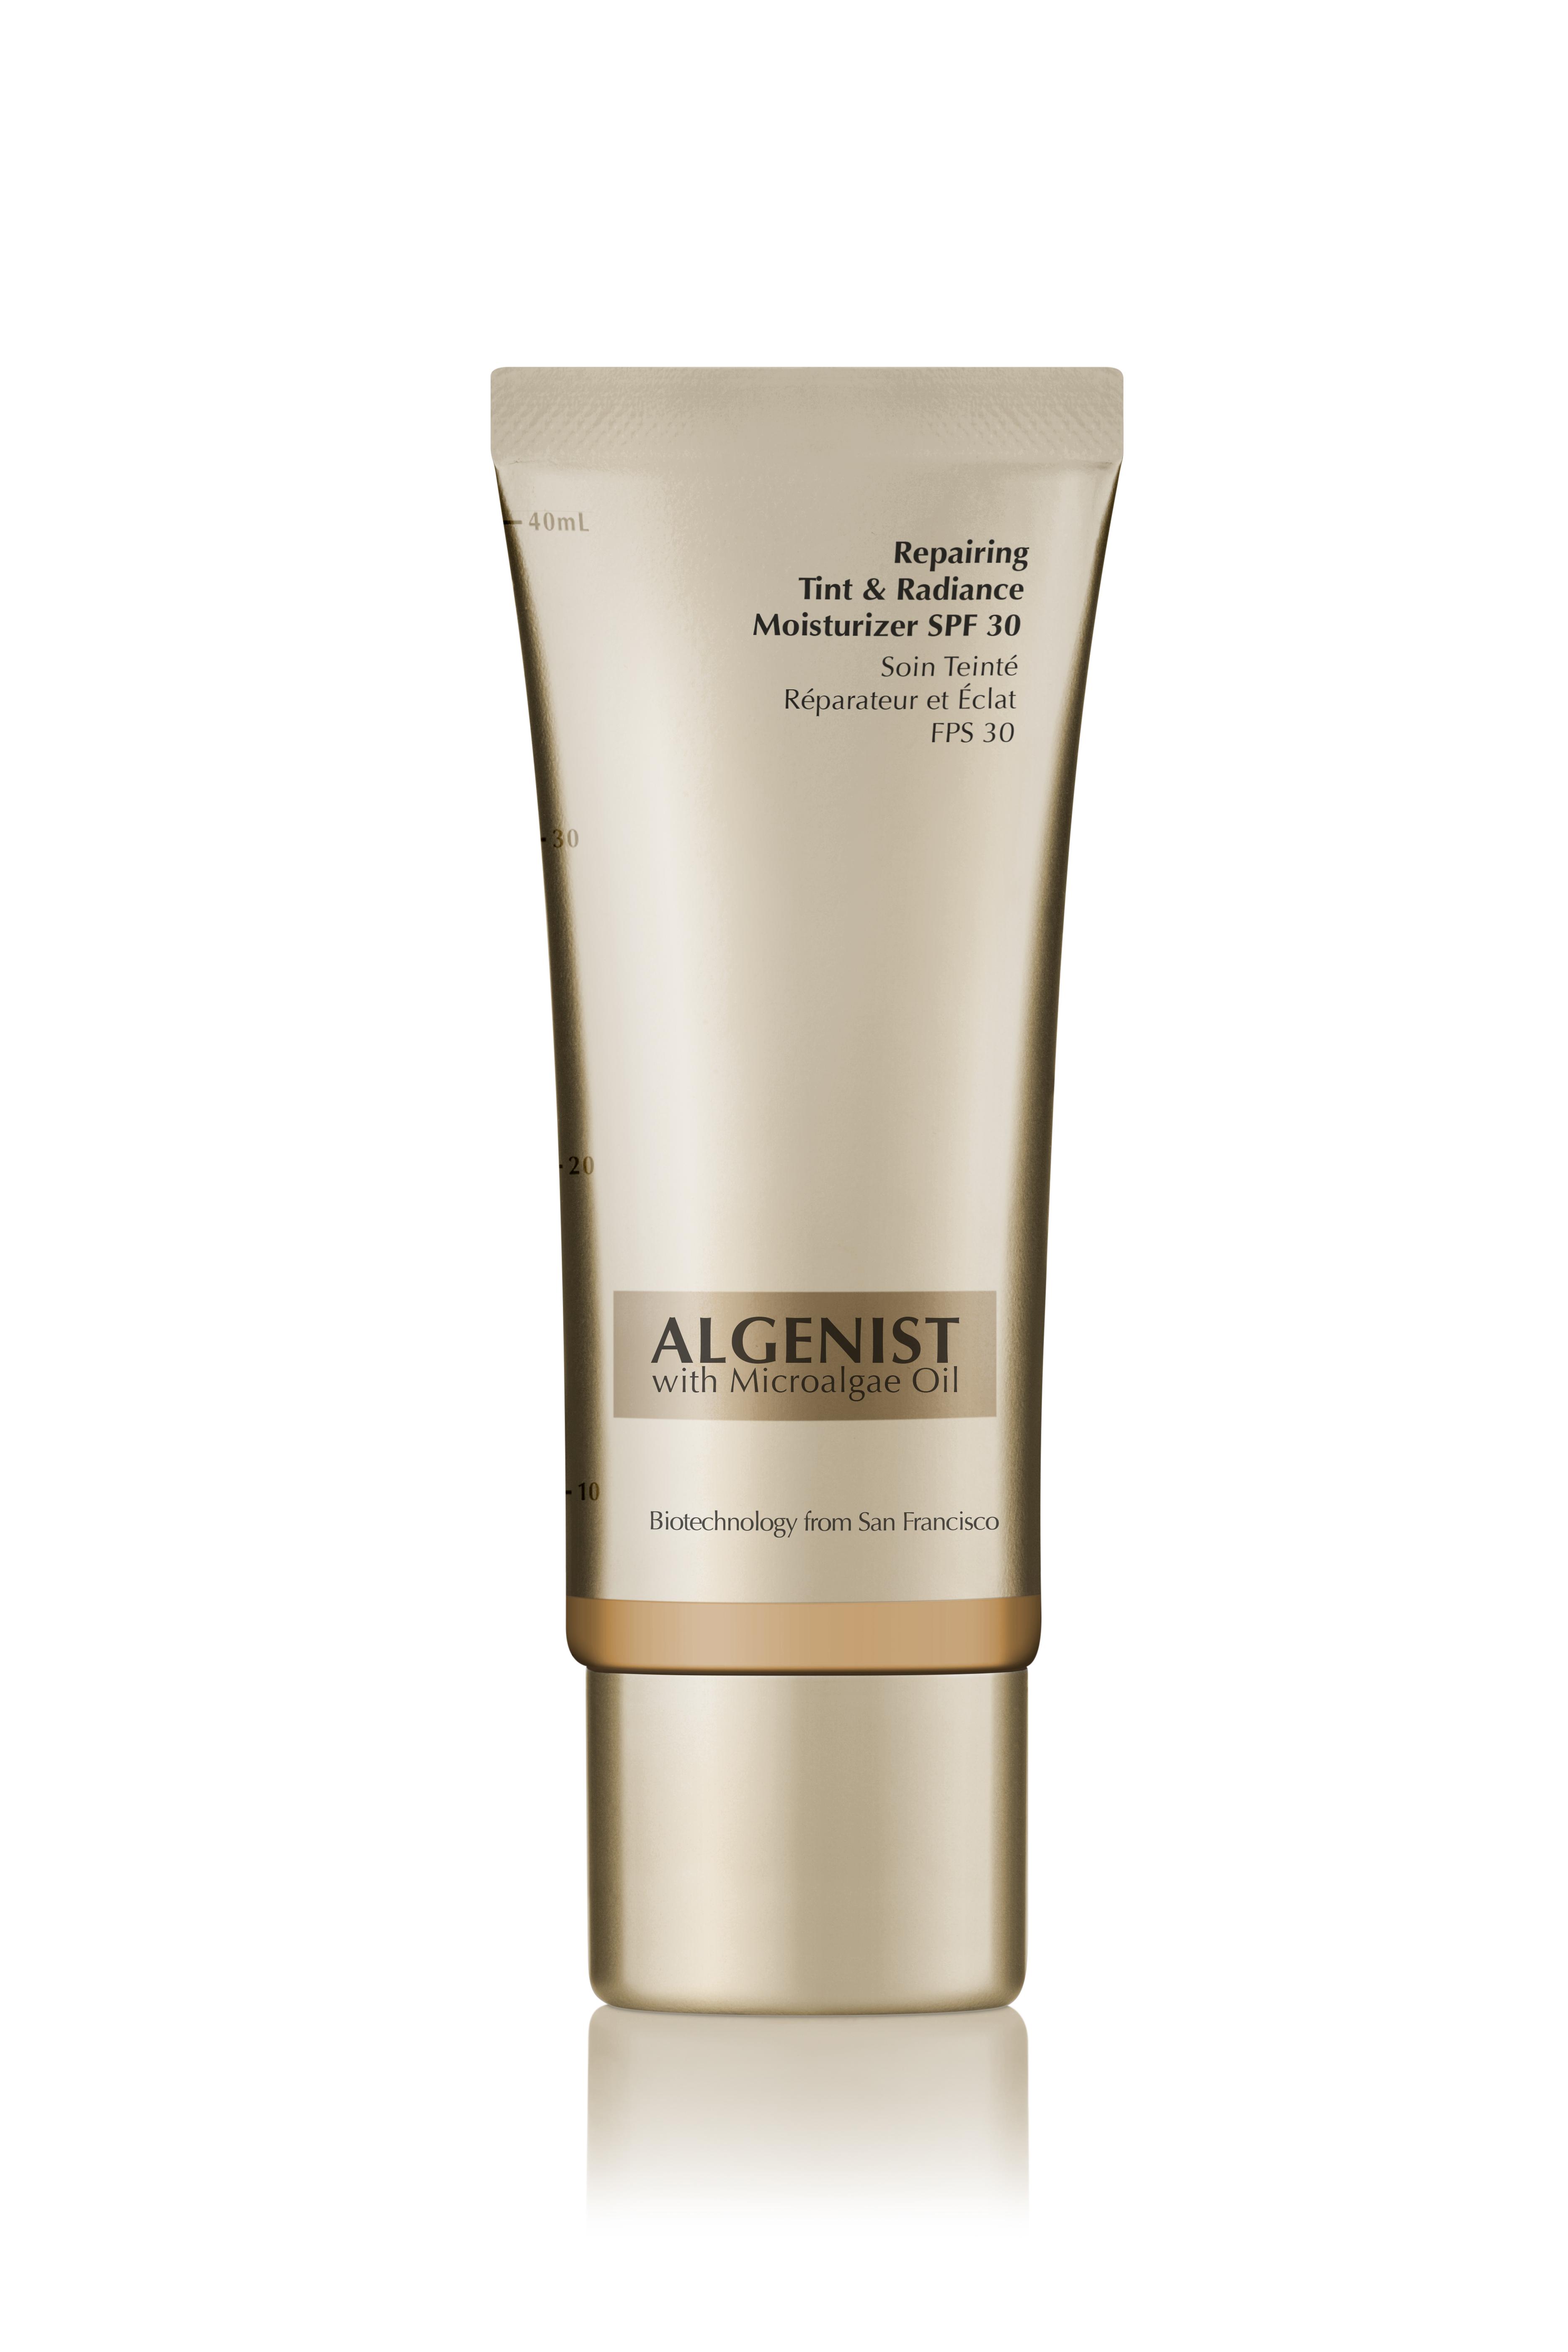 Algenist Tint & Radiance Moisturizer, 40 ml, tan